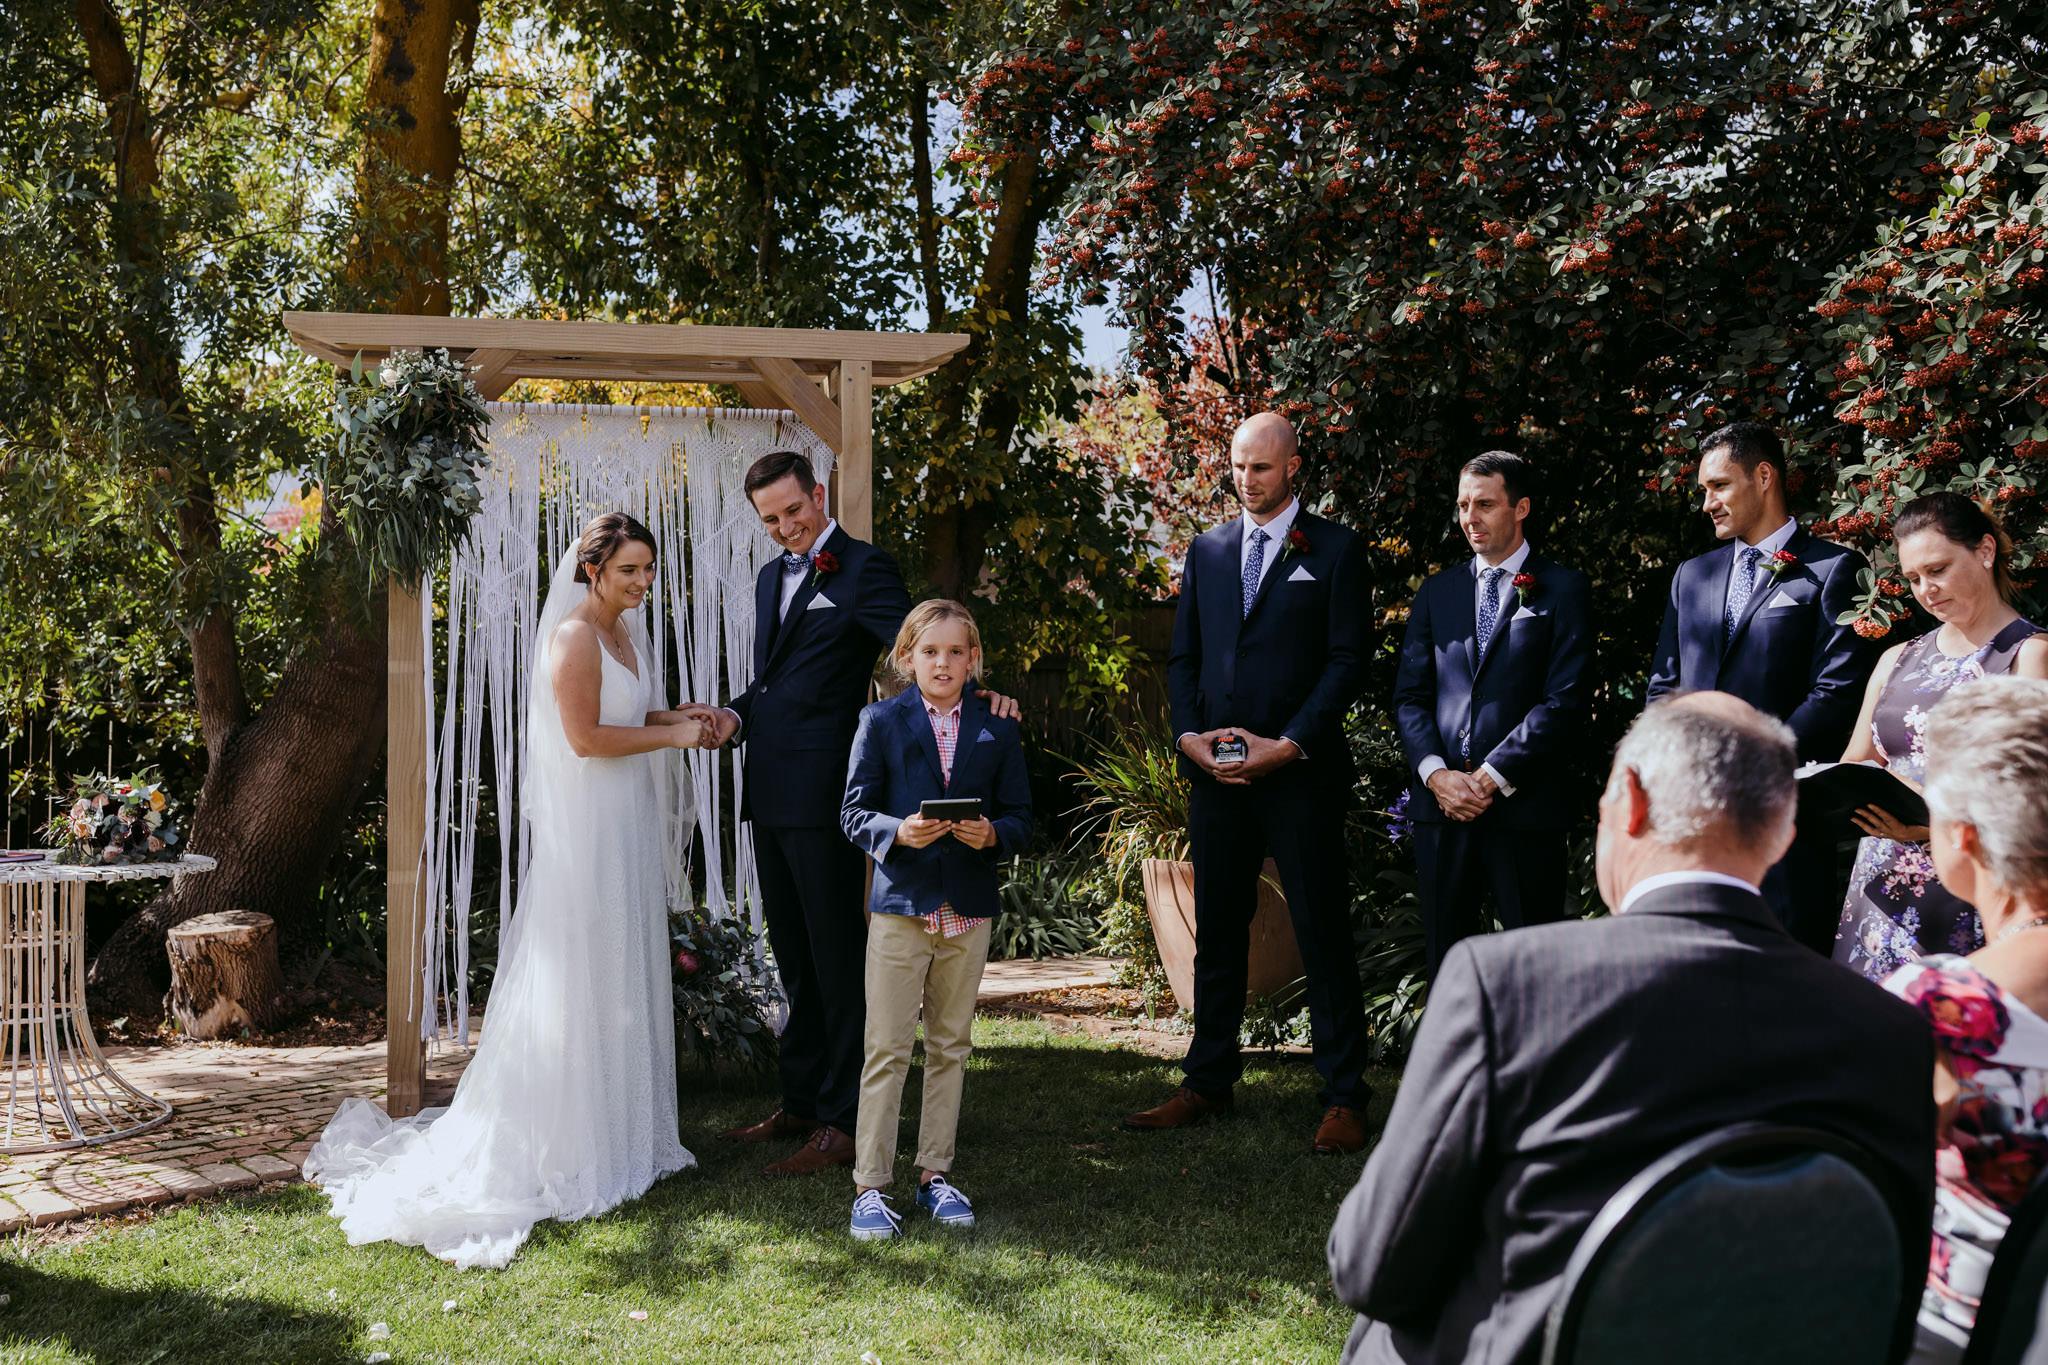 Erin Latimore Mudgee Canberra Wedding Photographer ROSEBANK GUESTHOUSE OLD THEATRE TONIC MILLTHORPE_232.JPG